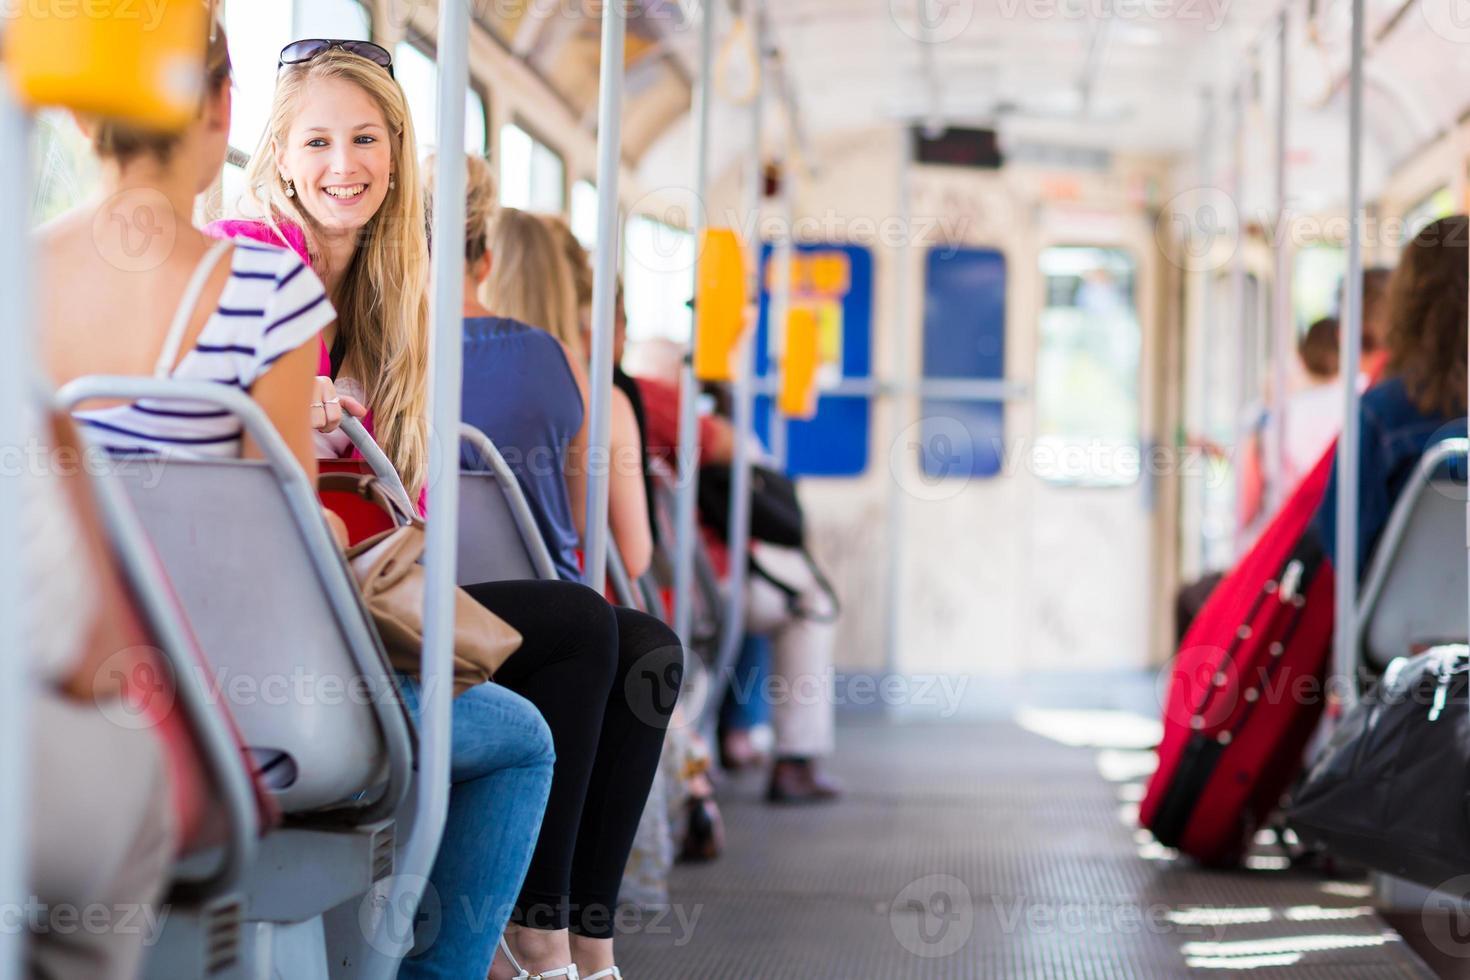 vacker, ung kvinna på en spårvagn / spårvagn foto